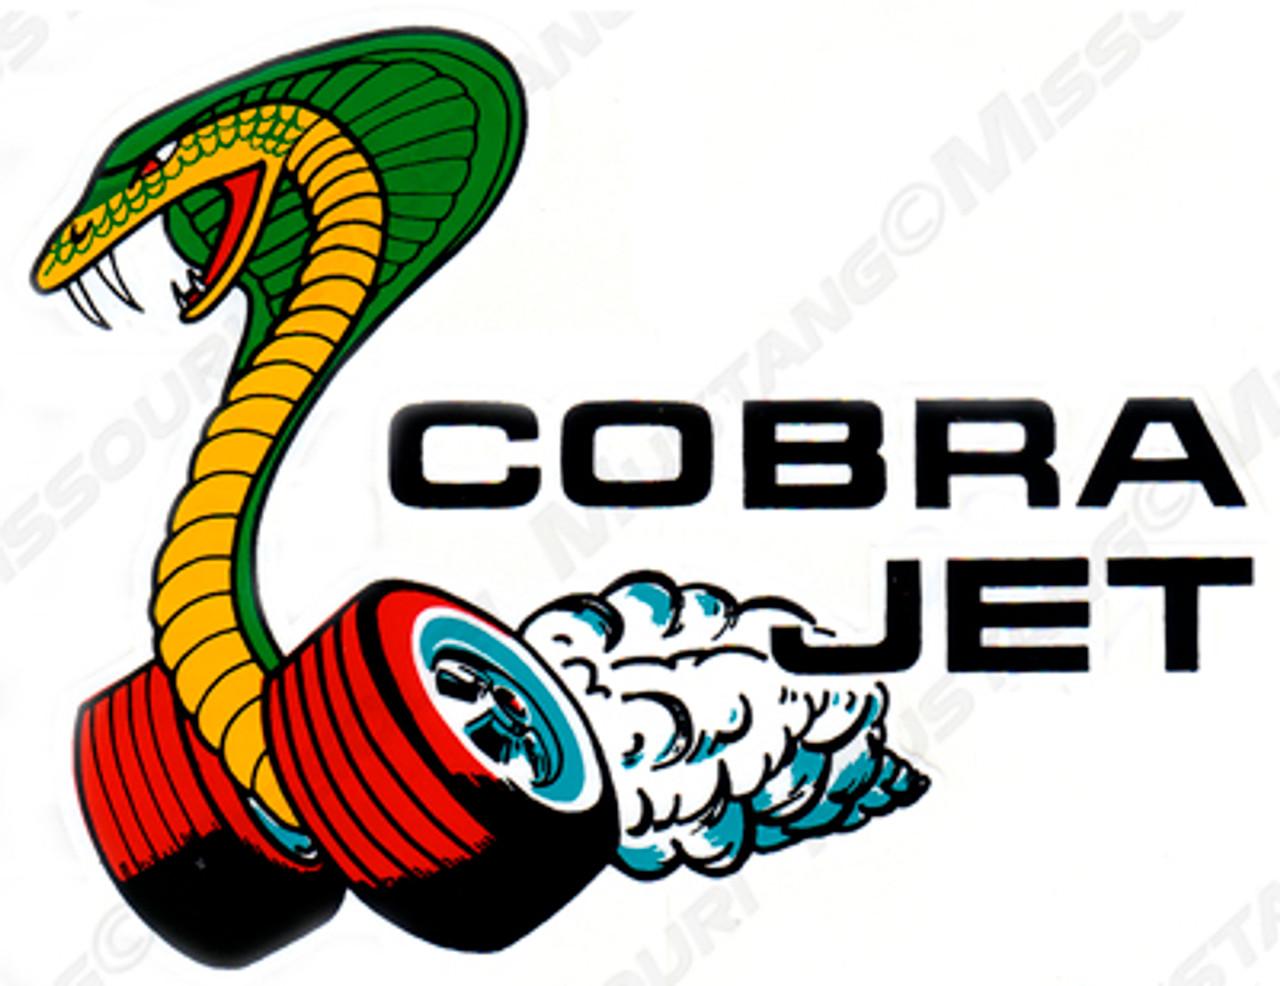 1964 73 ford mustang cobra jet decal rh missourimustang com ford cobra emblem